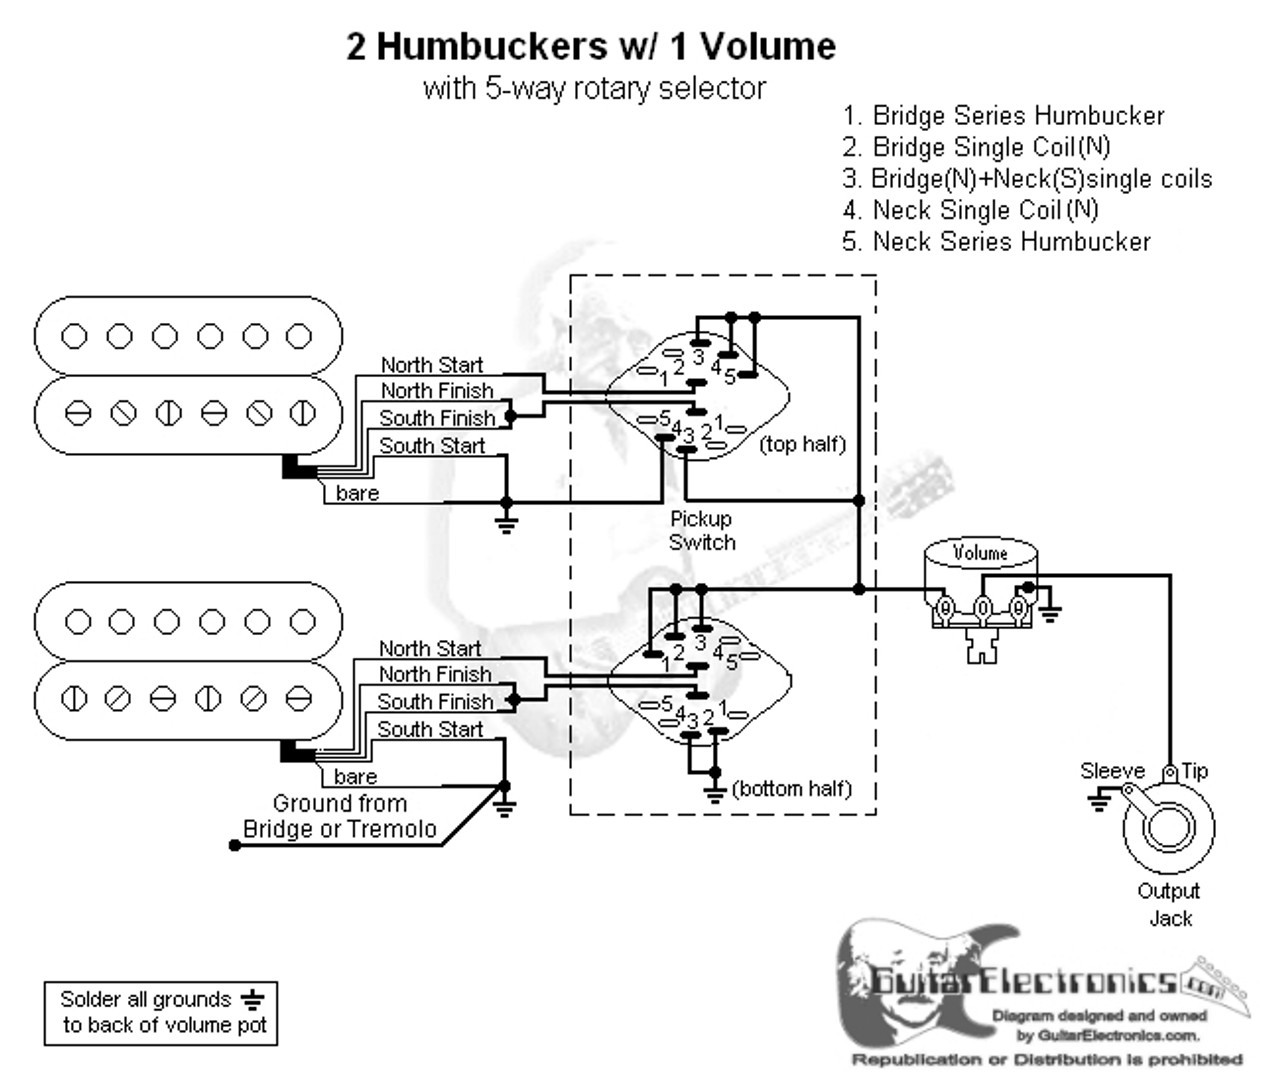 small resolution of 2 humbuckers 5 way rotary switch 1 volume 01 5 way switch wiring diagram leviton 5 way rotary switch wiring diagram